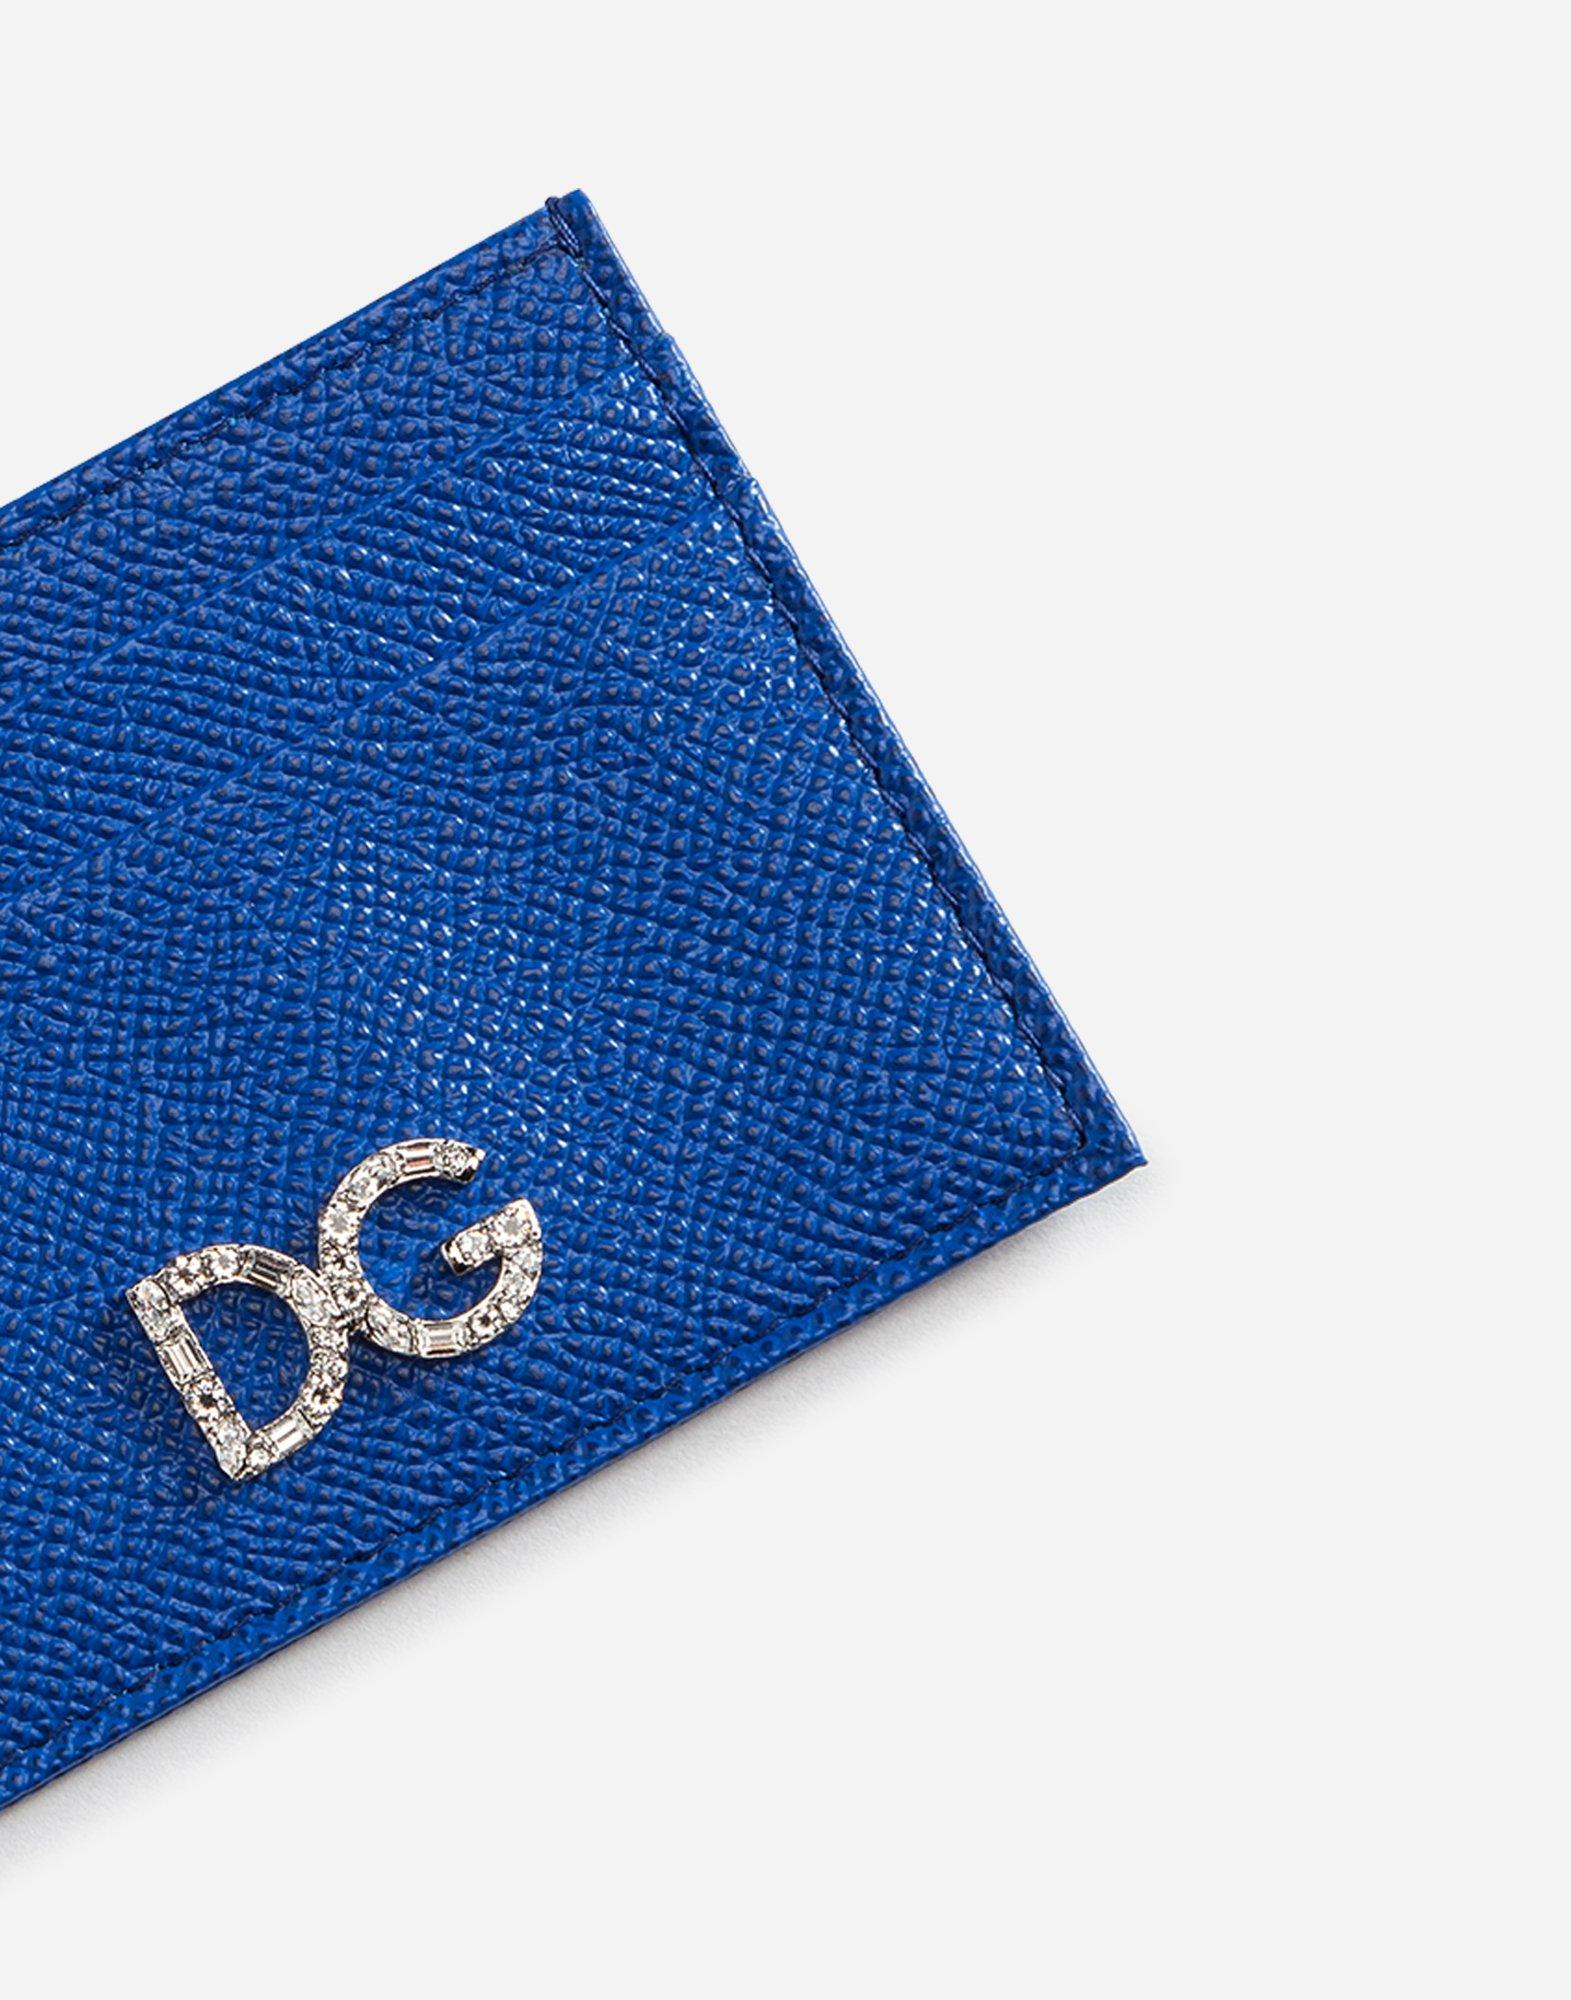 Dolce&Gabbana DAUPHINE CALFSKIN CARD HOLDER WITH DG CRYSTAL LOGO